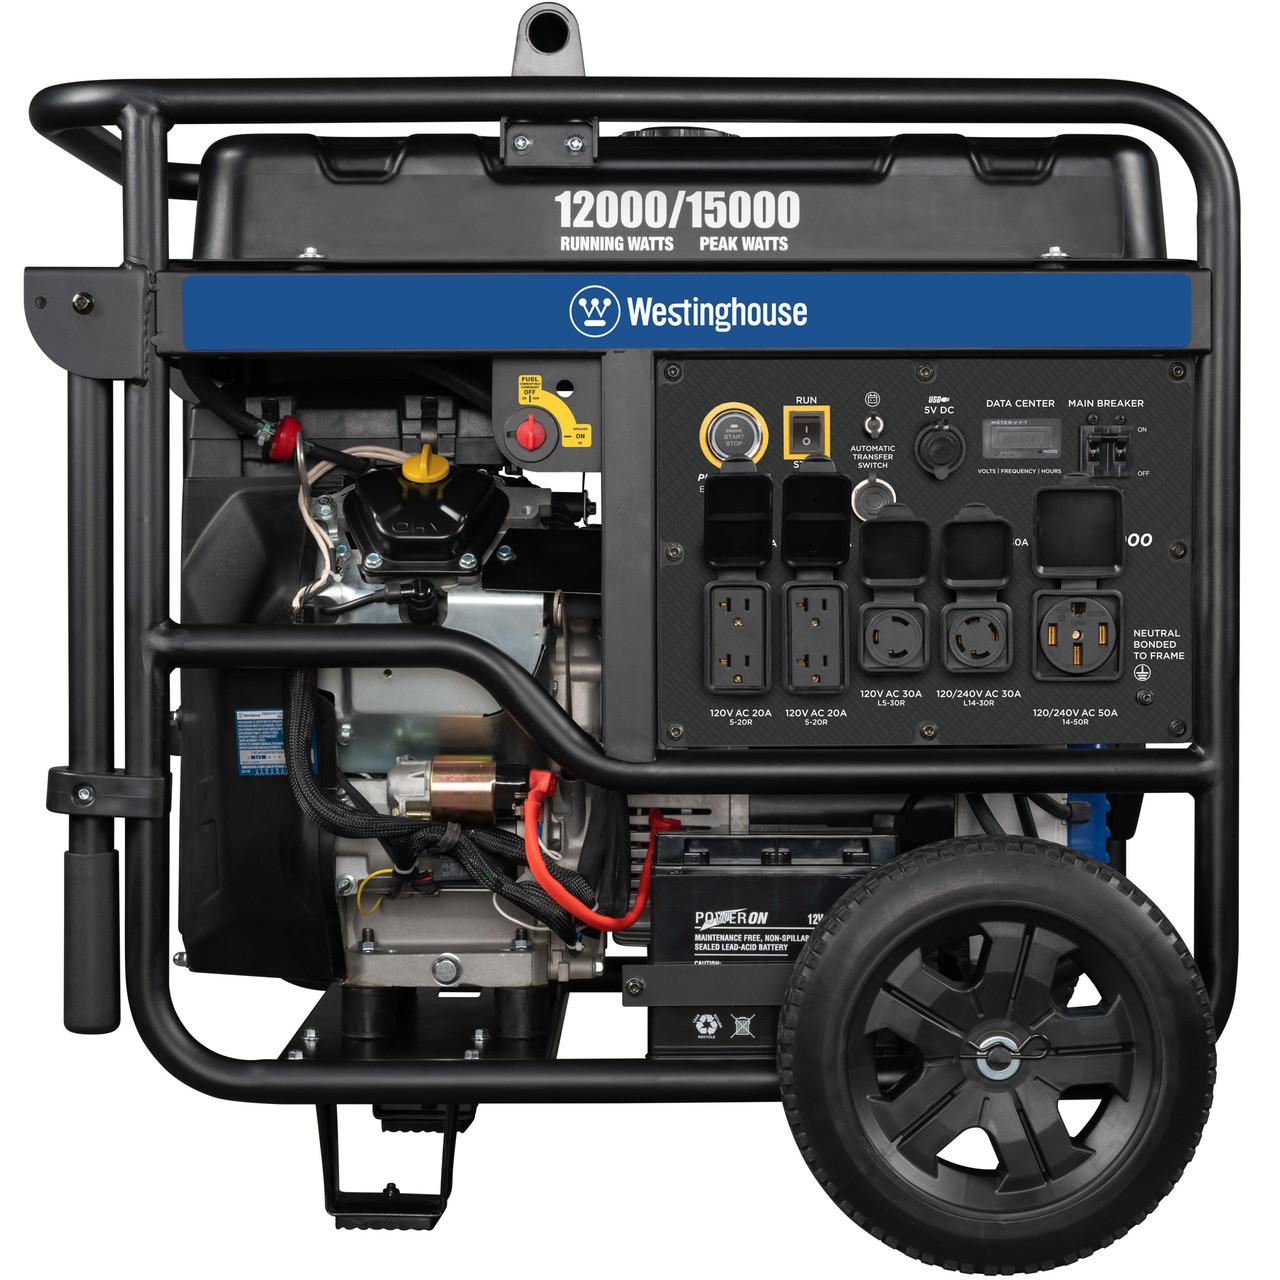 westinghouse wgen12000 12000w electric start portable generator free shipping [ 1280 x 1280 Pixel ]